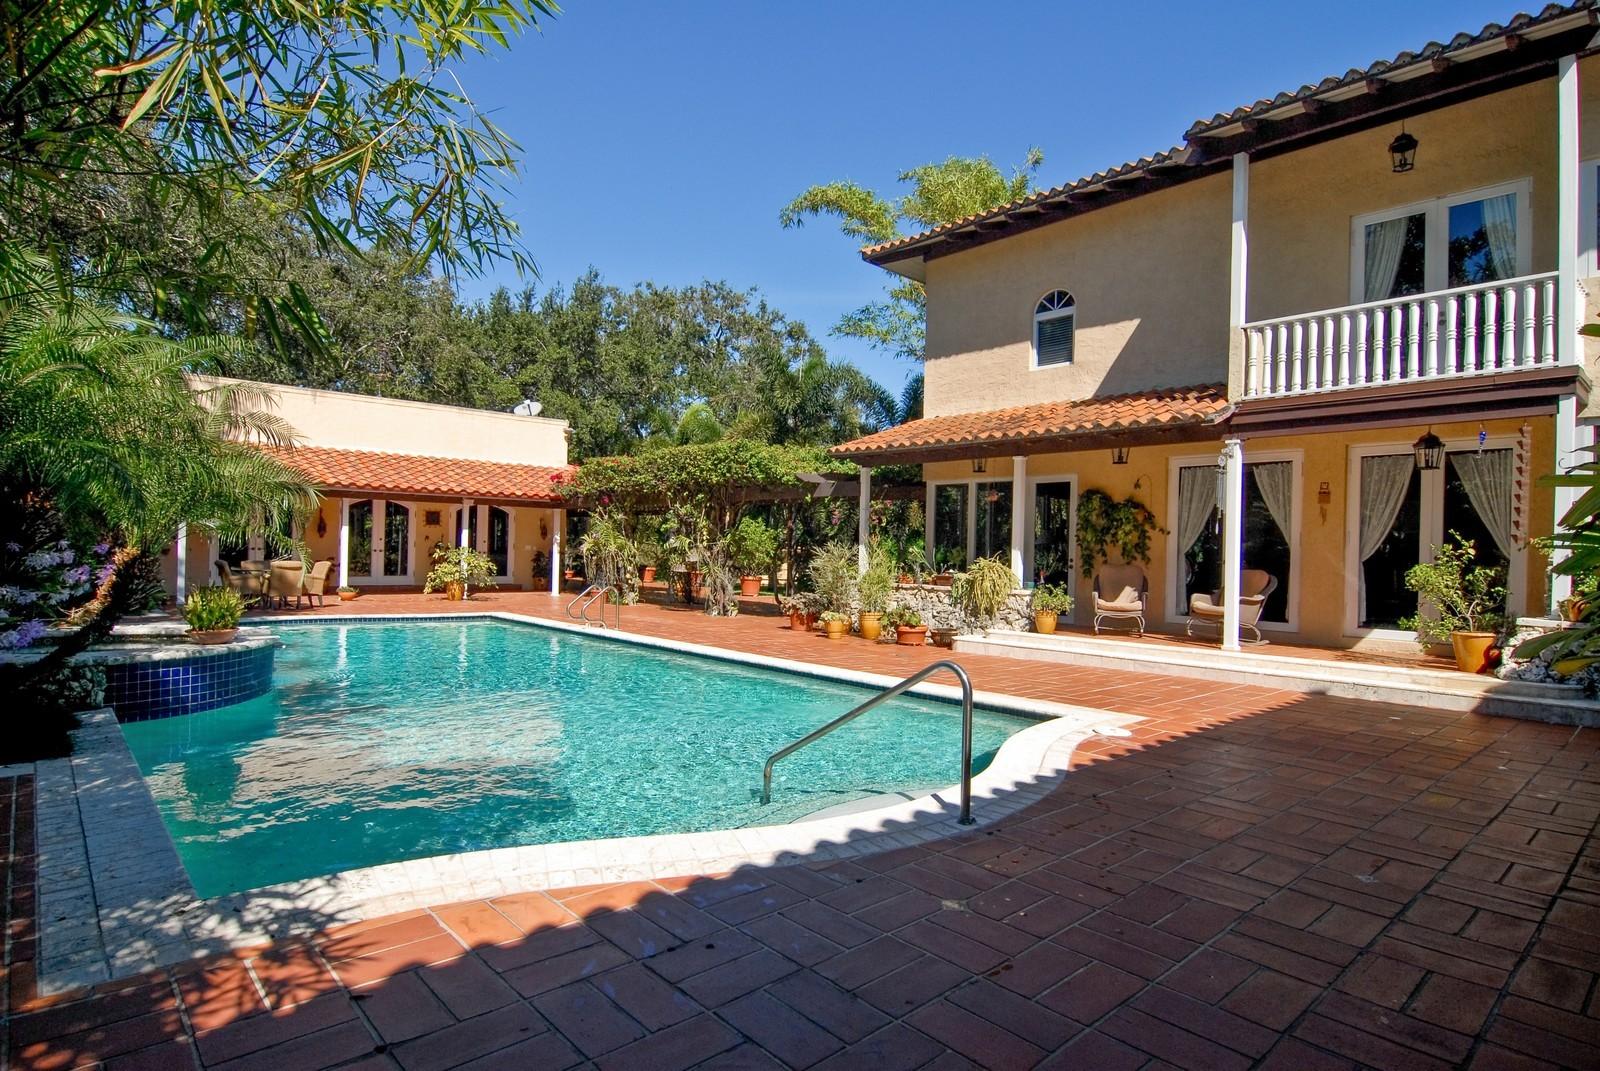 Real Estate Photography - 4845 Davis Rd, Miami, FL, 33143 - Pool